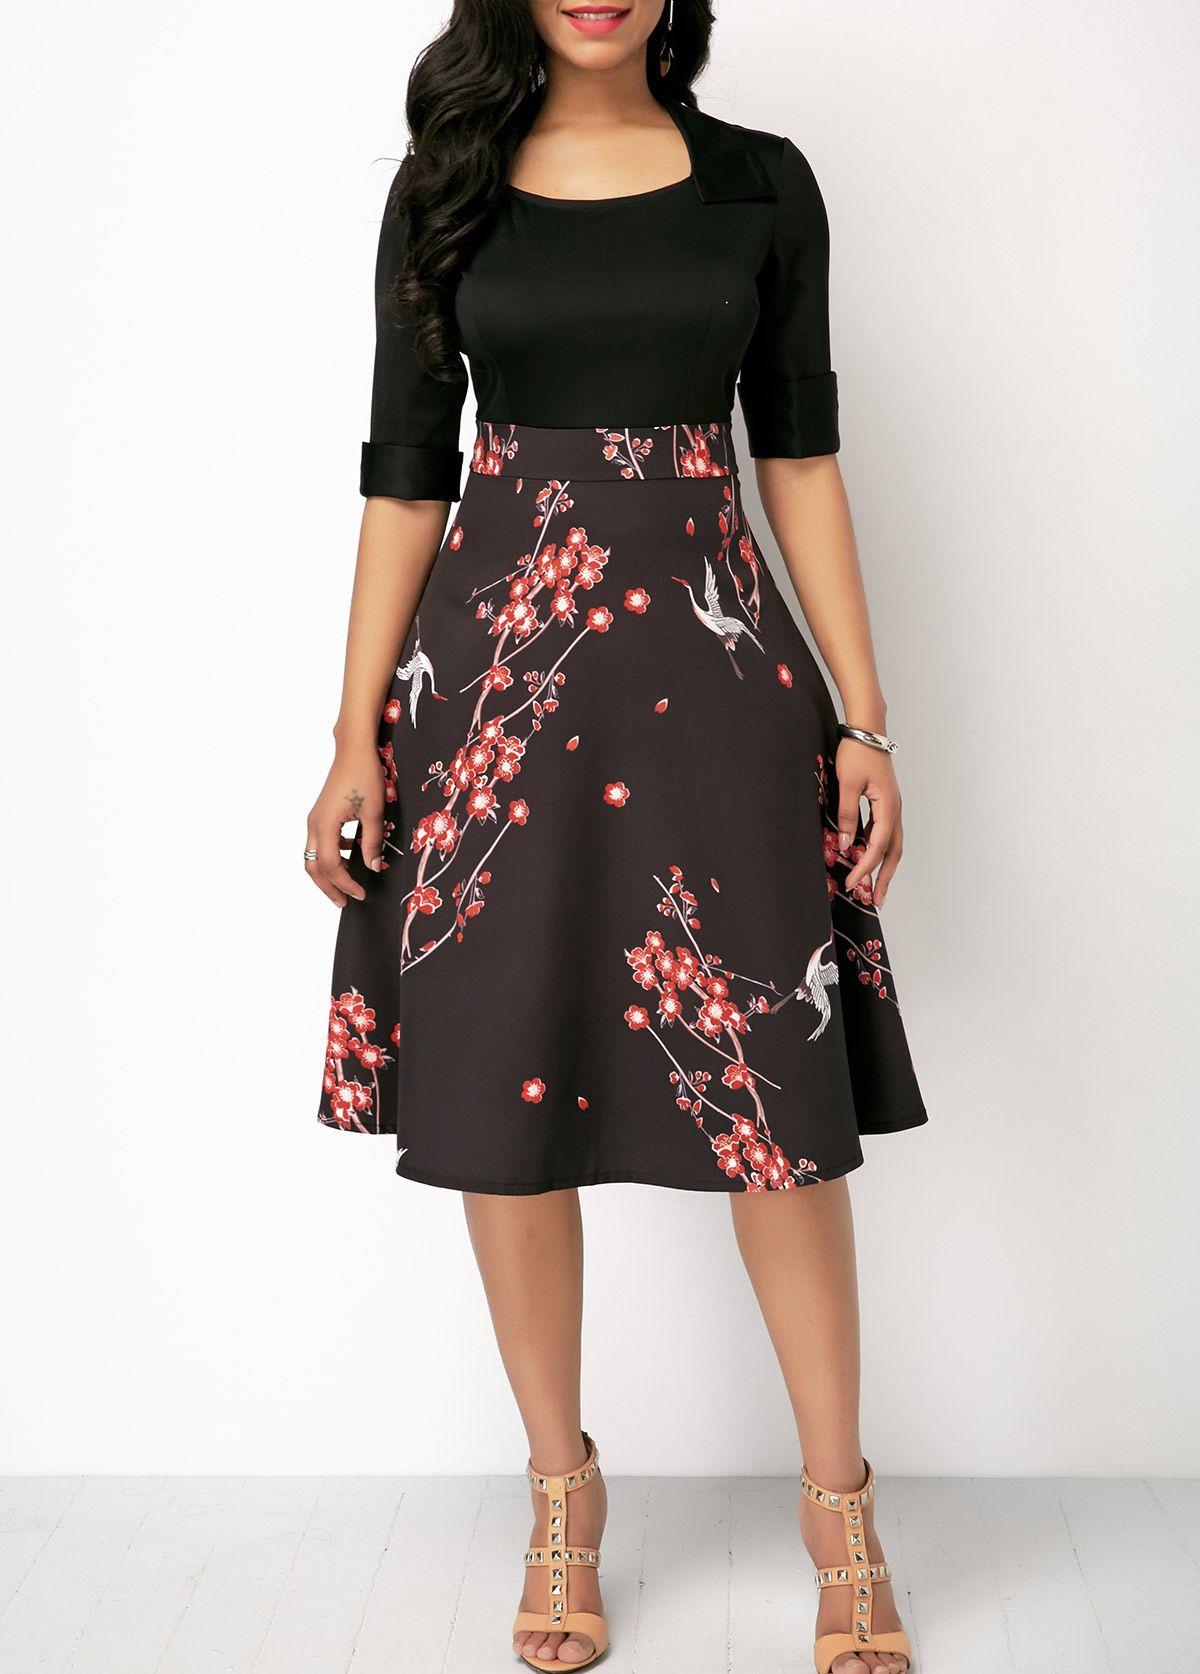 8c13bad309 Black Half Sleeve High Waist Printed Dress